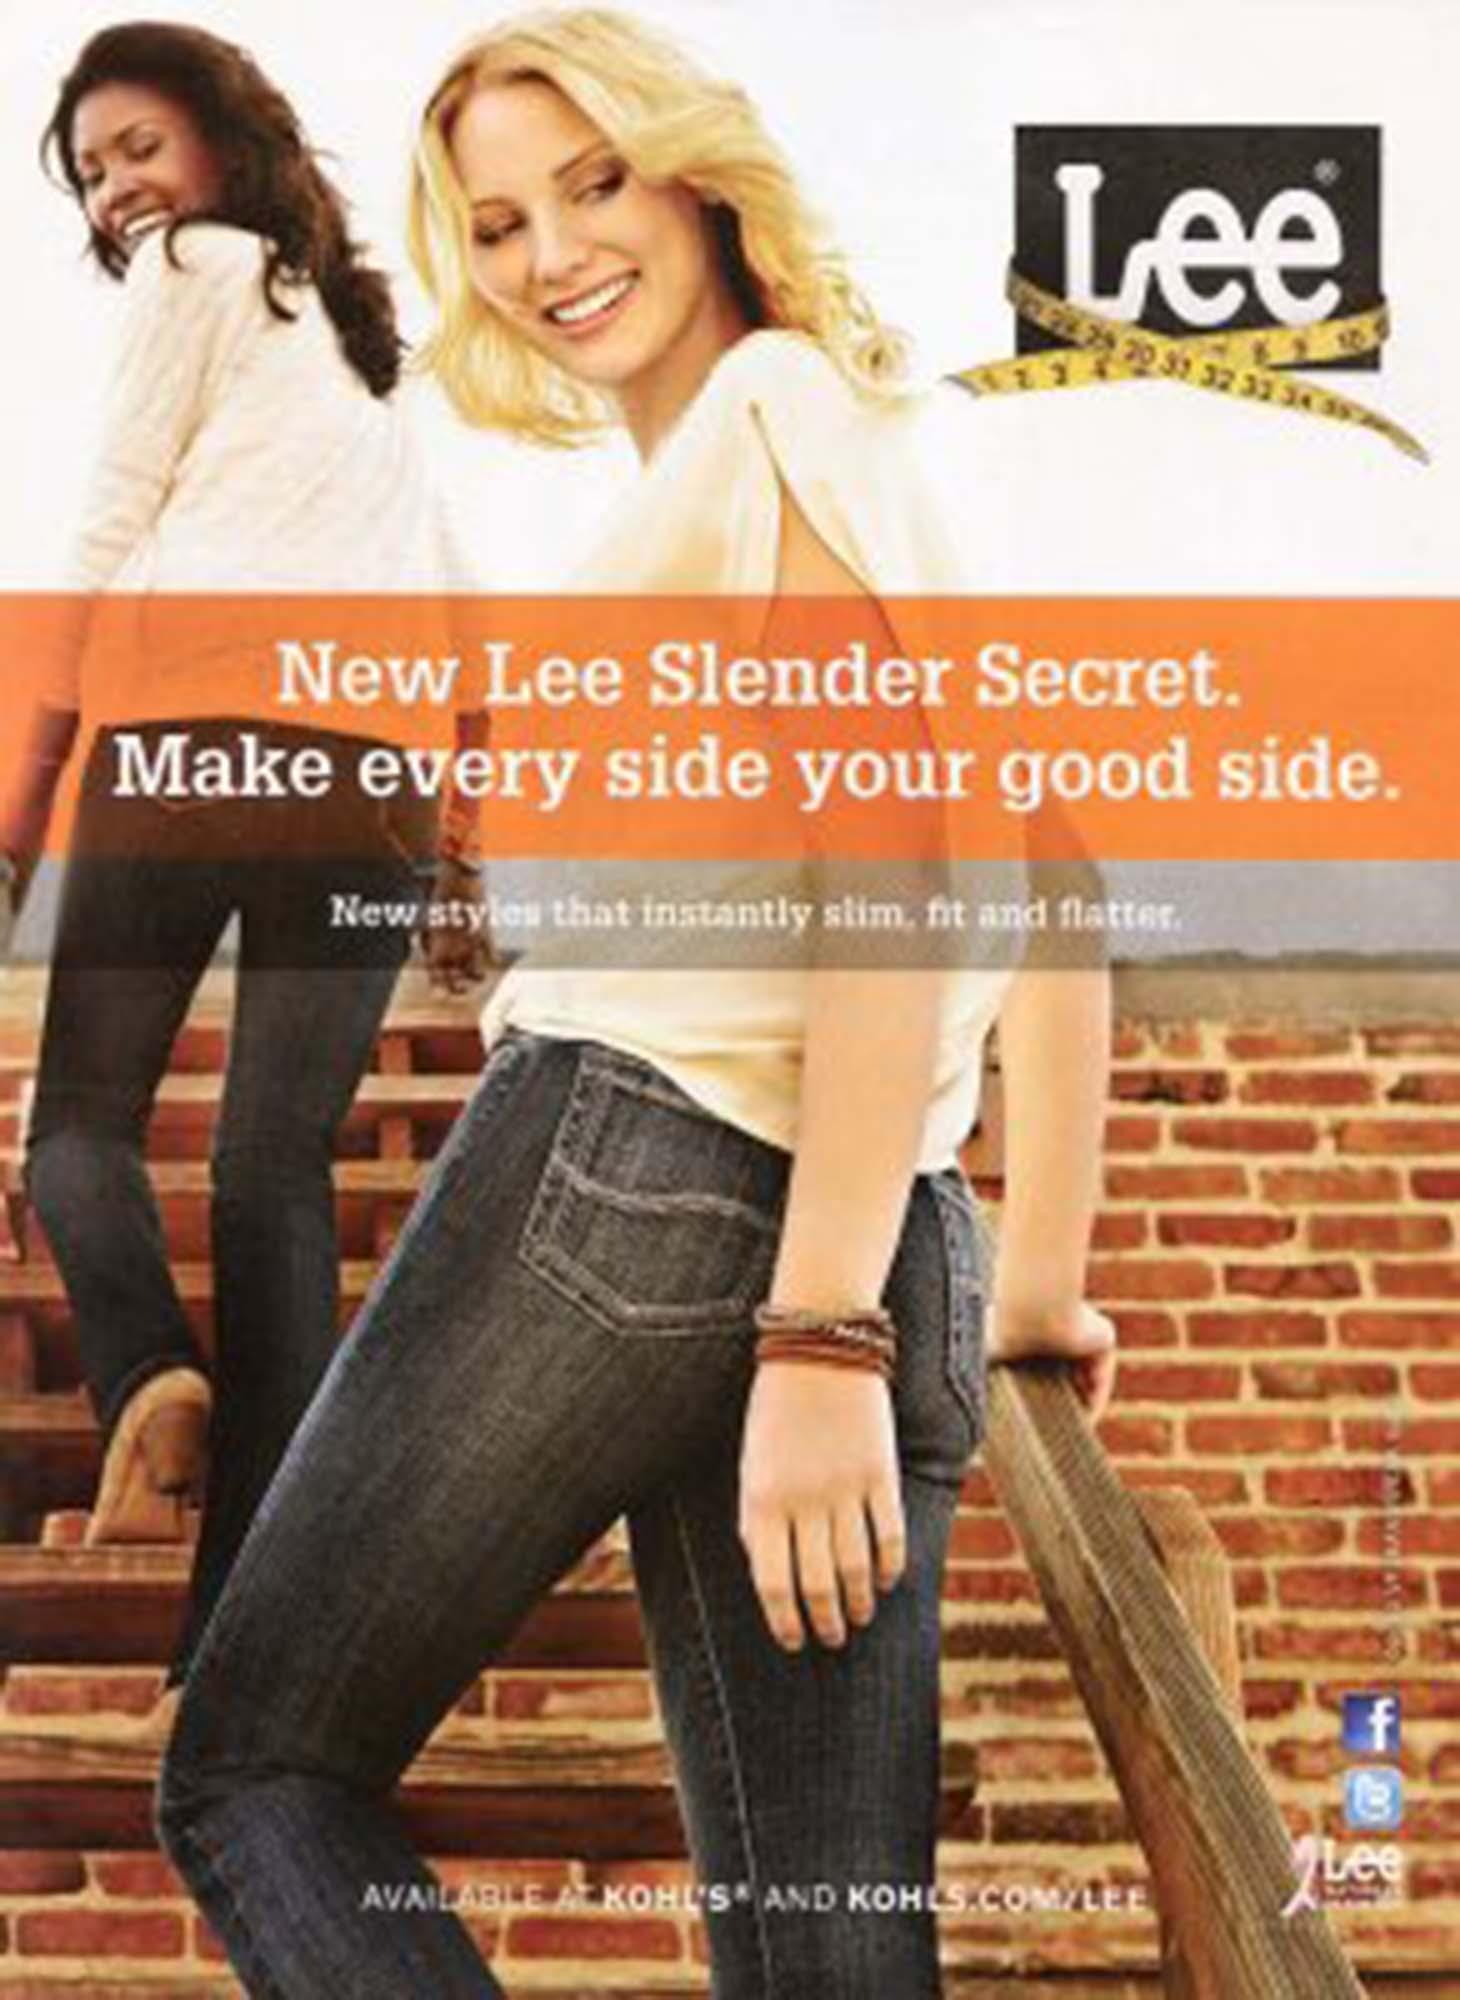 Woman wearing new slender Lee jeans